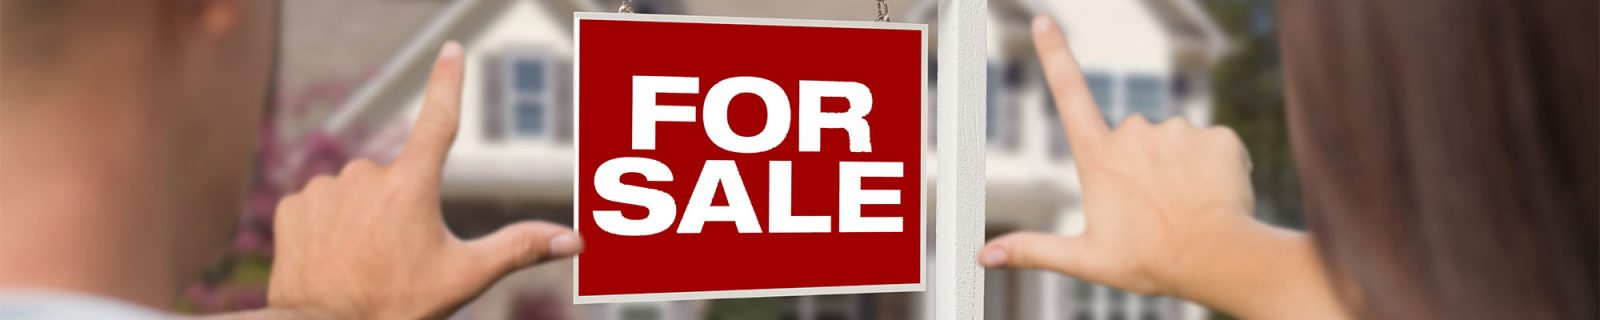 Sellers Guide - Alhambra Villas - Houses for Sale in Spain